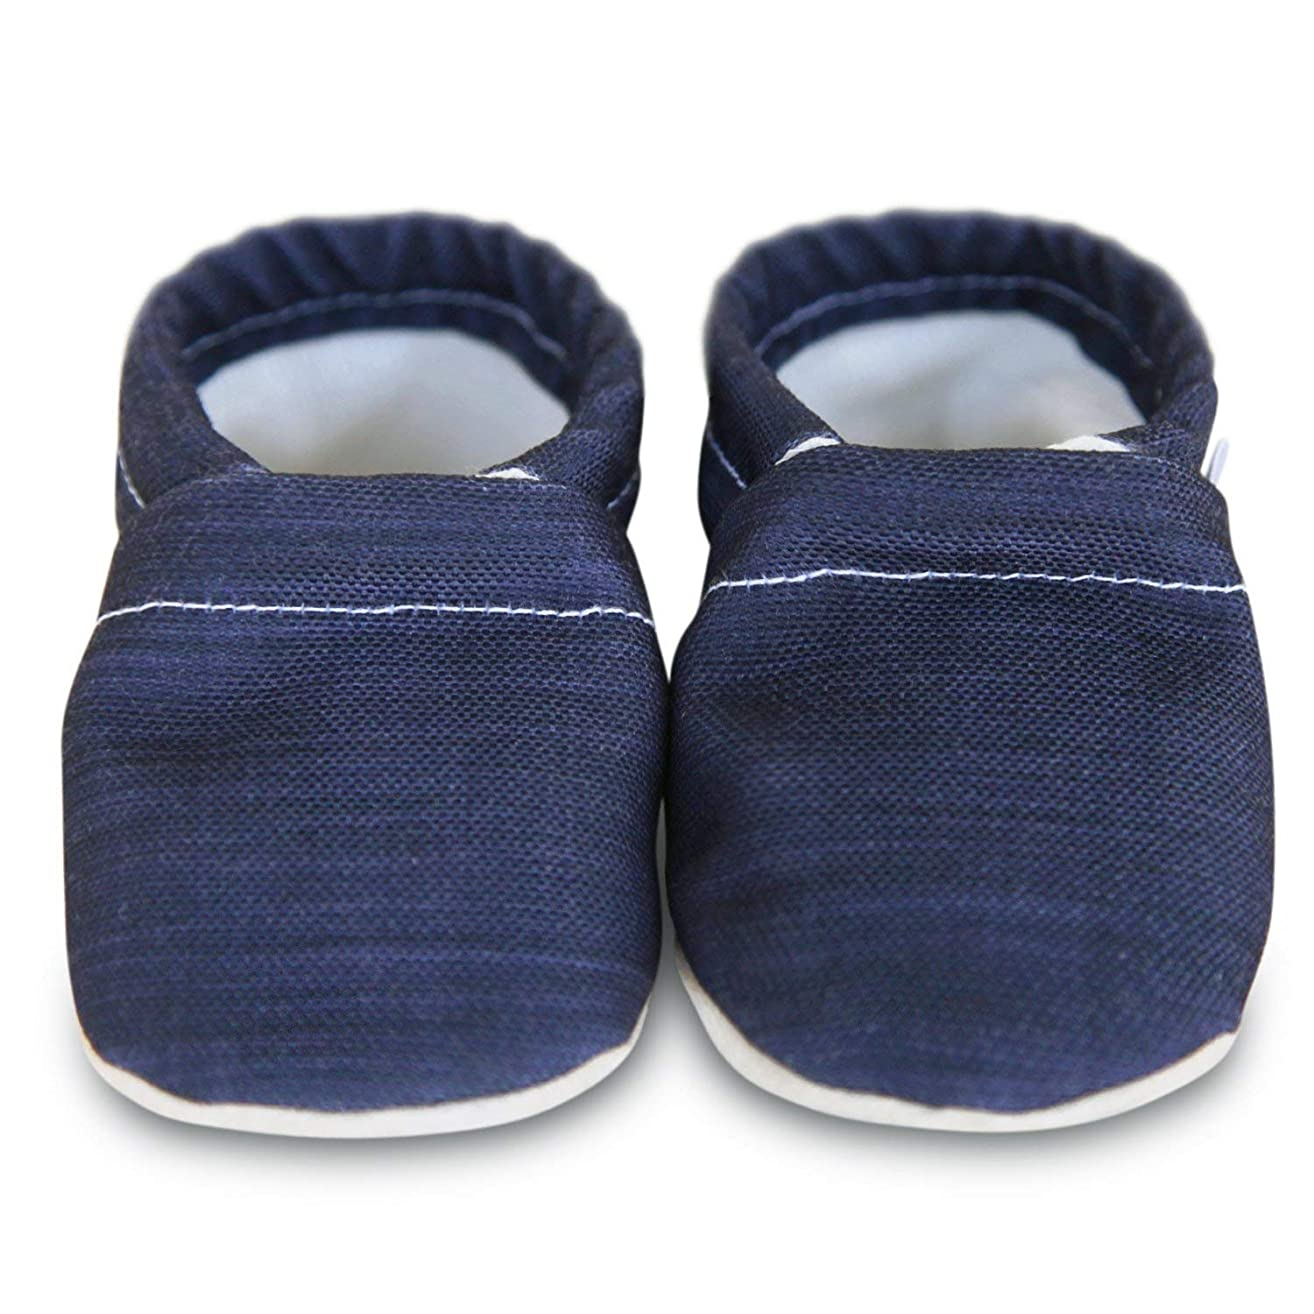 CLAMFEET Organic soft soled baby shoes, ZACH